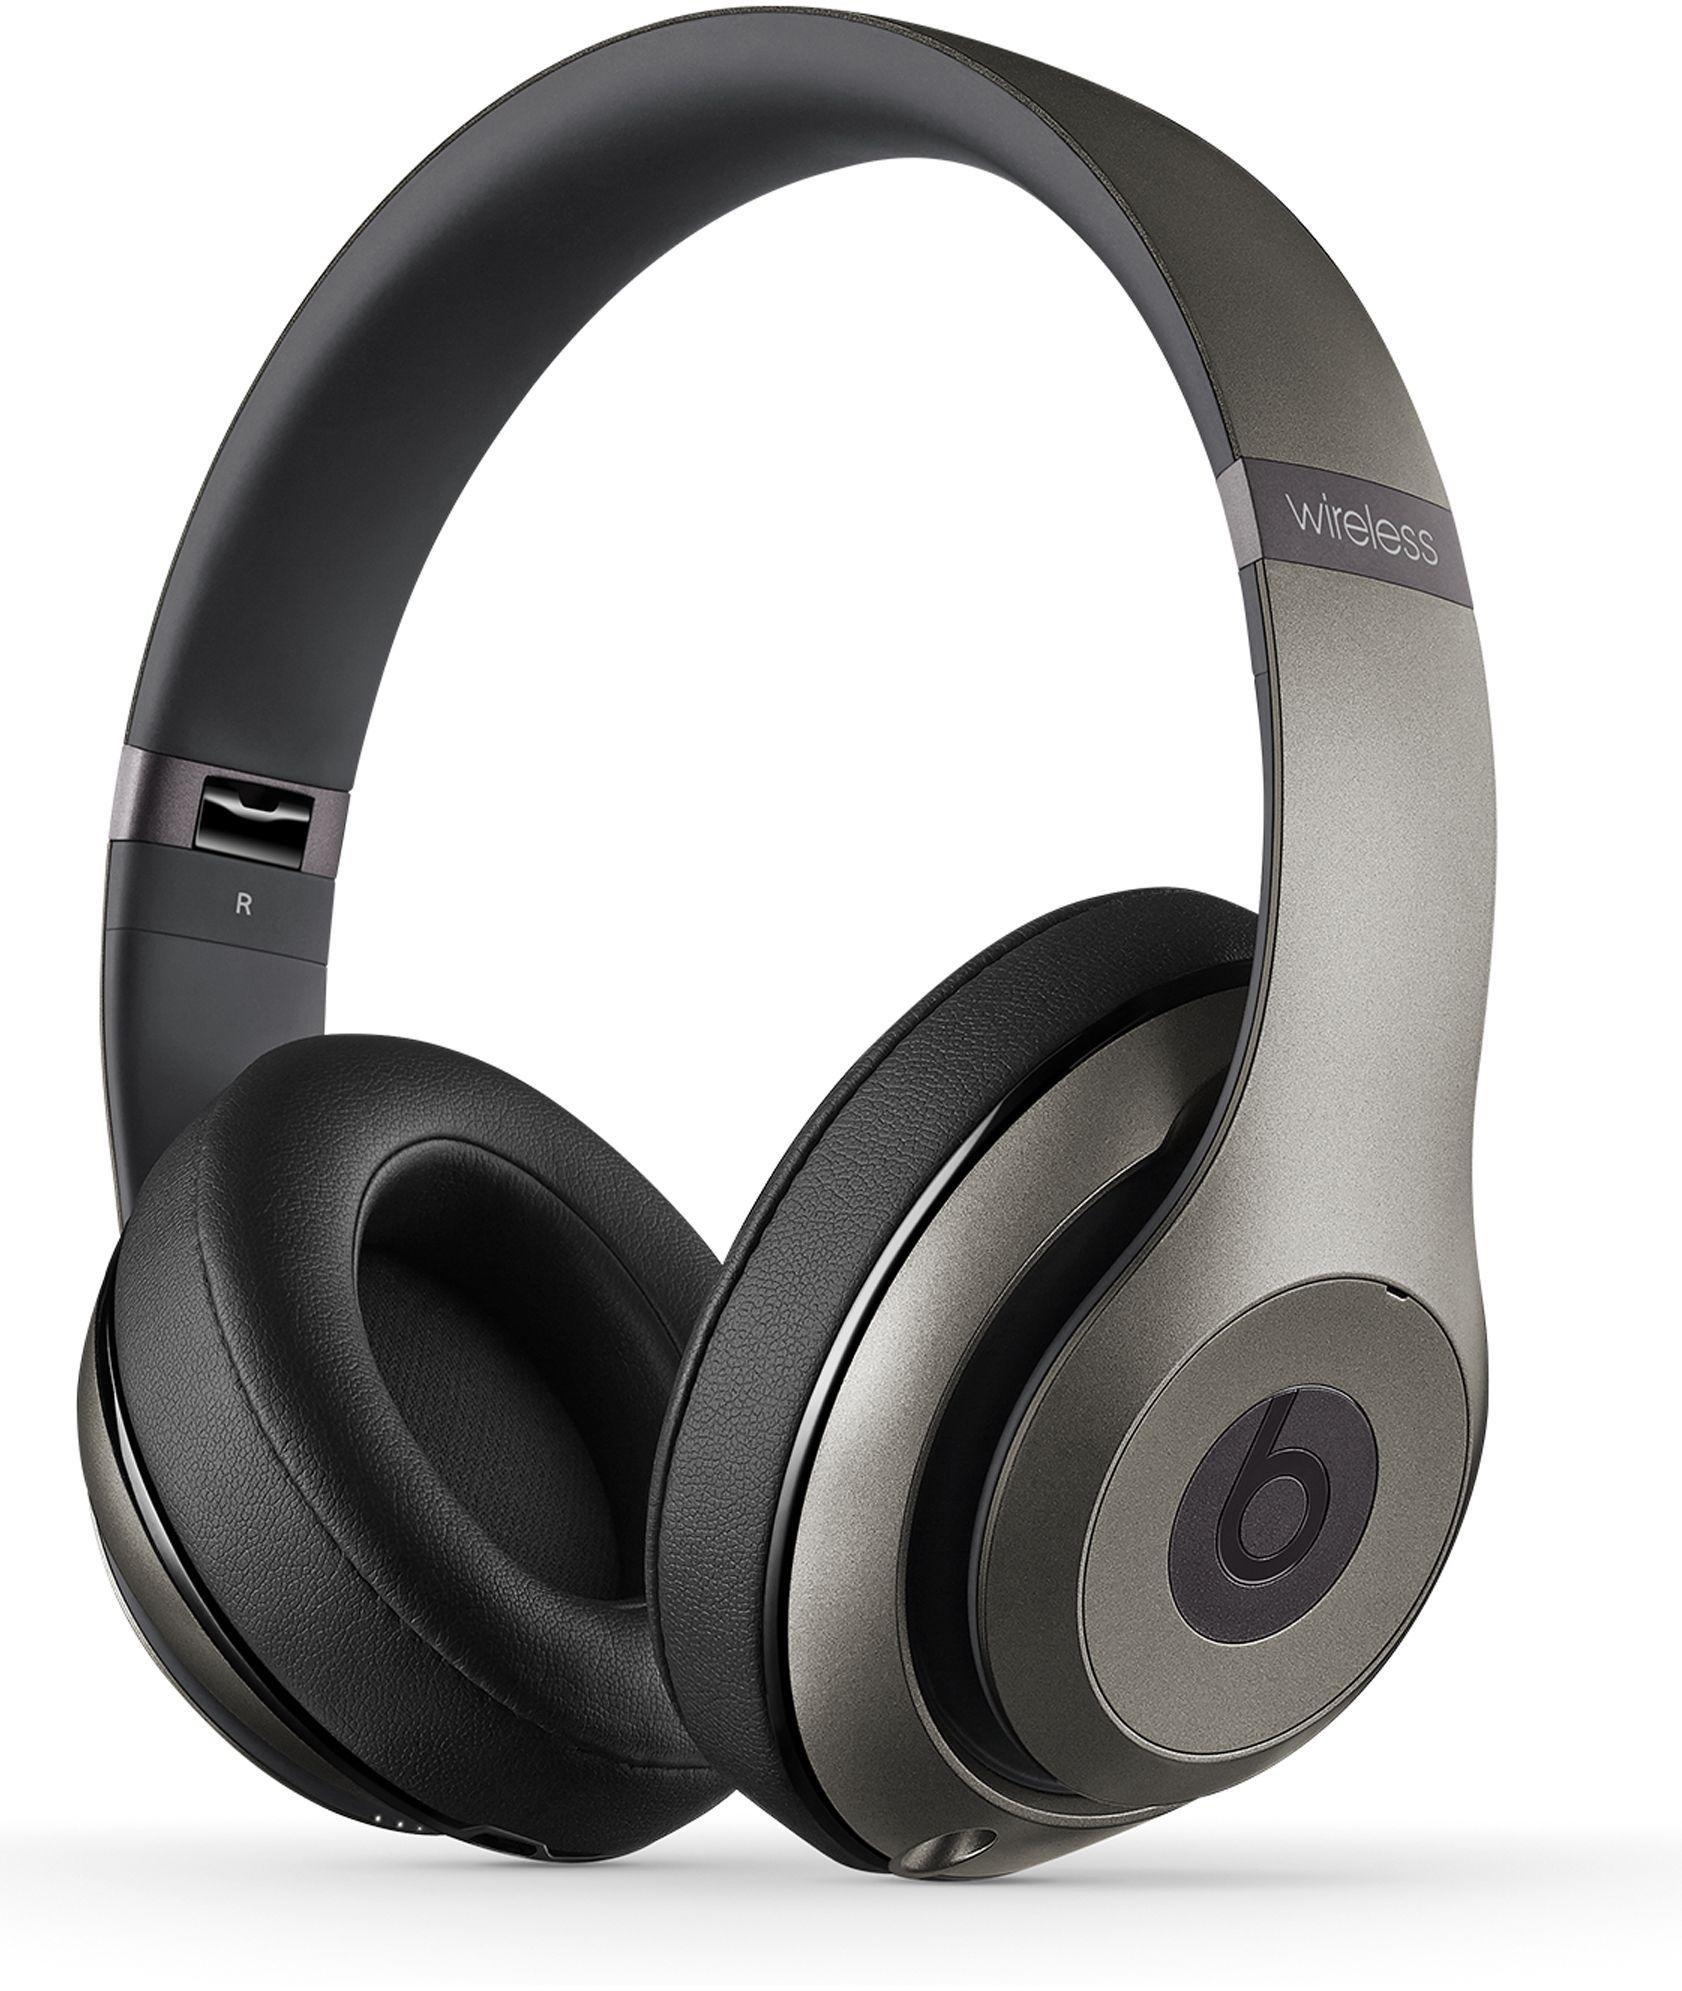 Beats - by Dre - Studio Wireless Headphones - Titanium